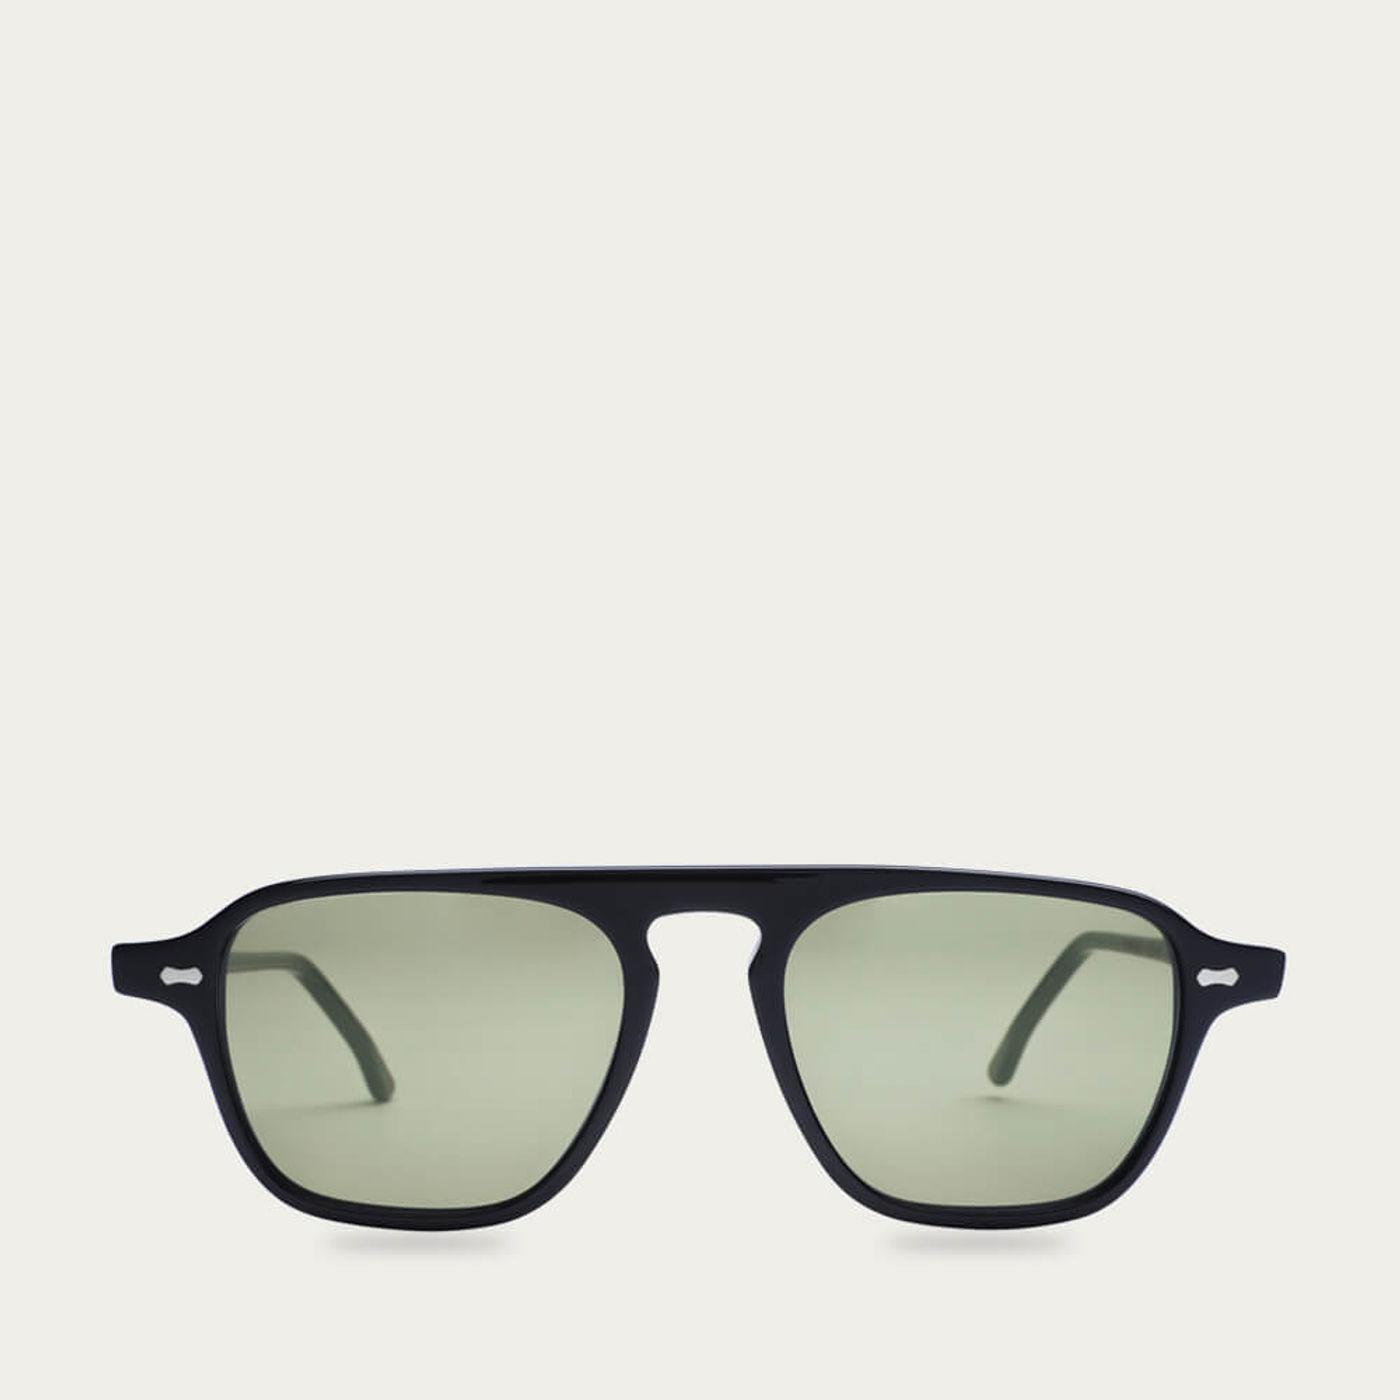 Black /Bottle Green Panama Sunglasses | Bombinate